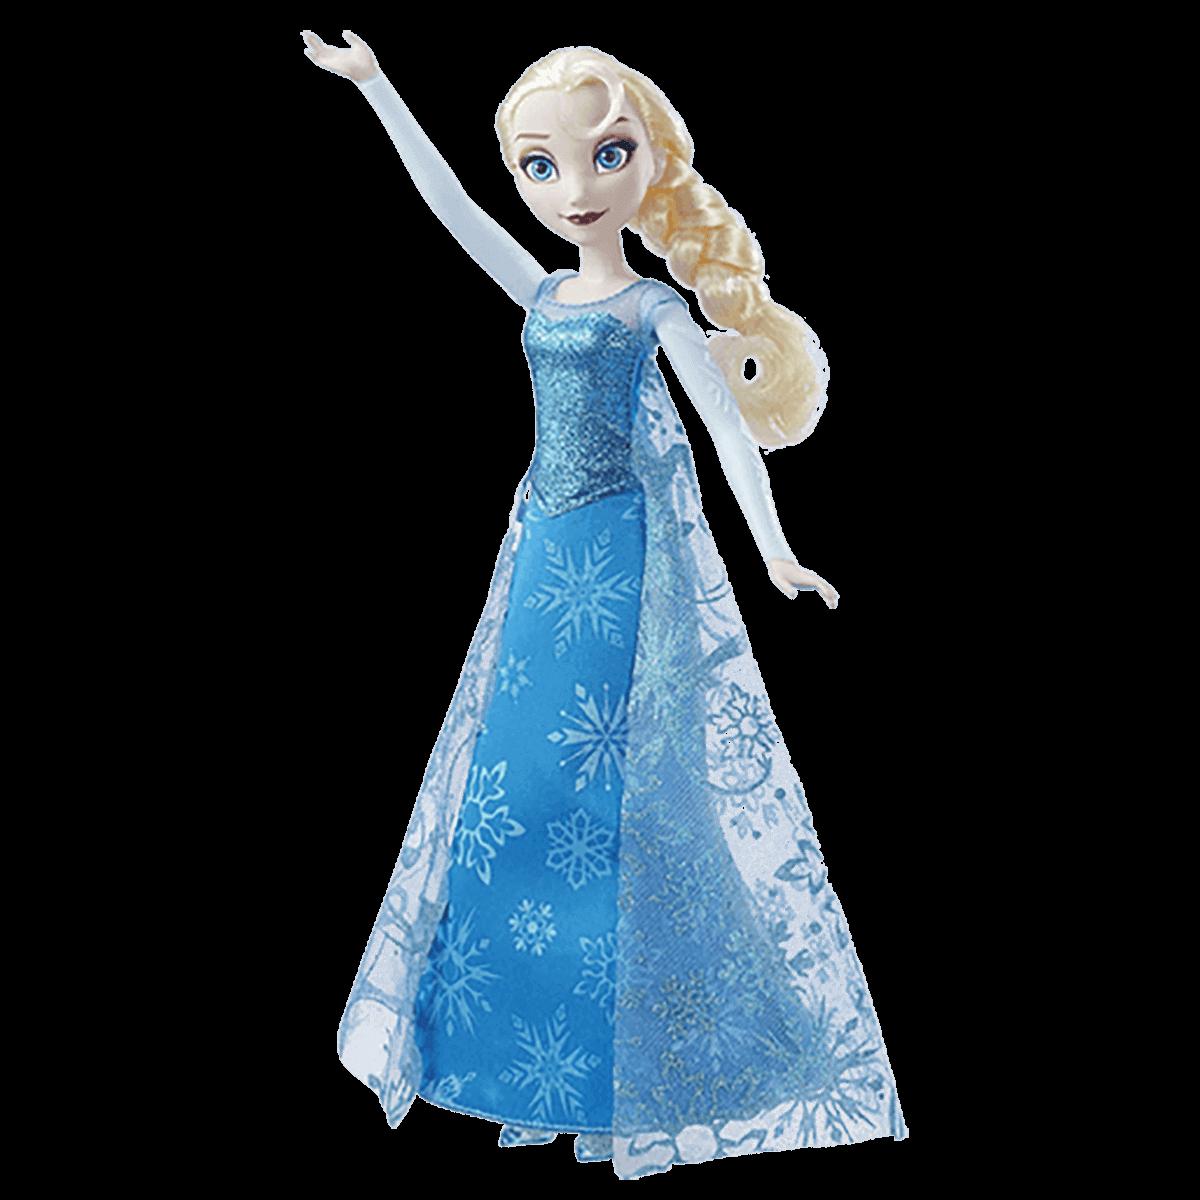 dba3ccb4825 Frozen Musical Lights - Elsa Doll | The Entertainer